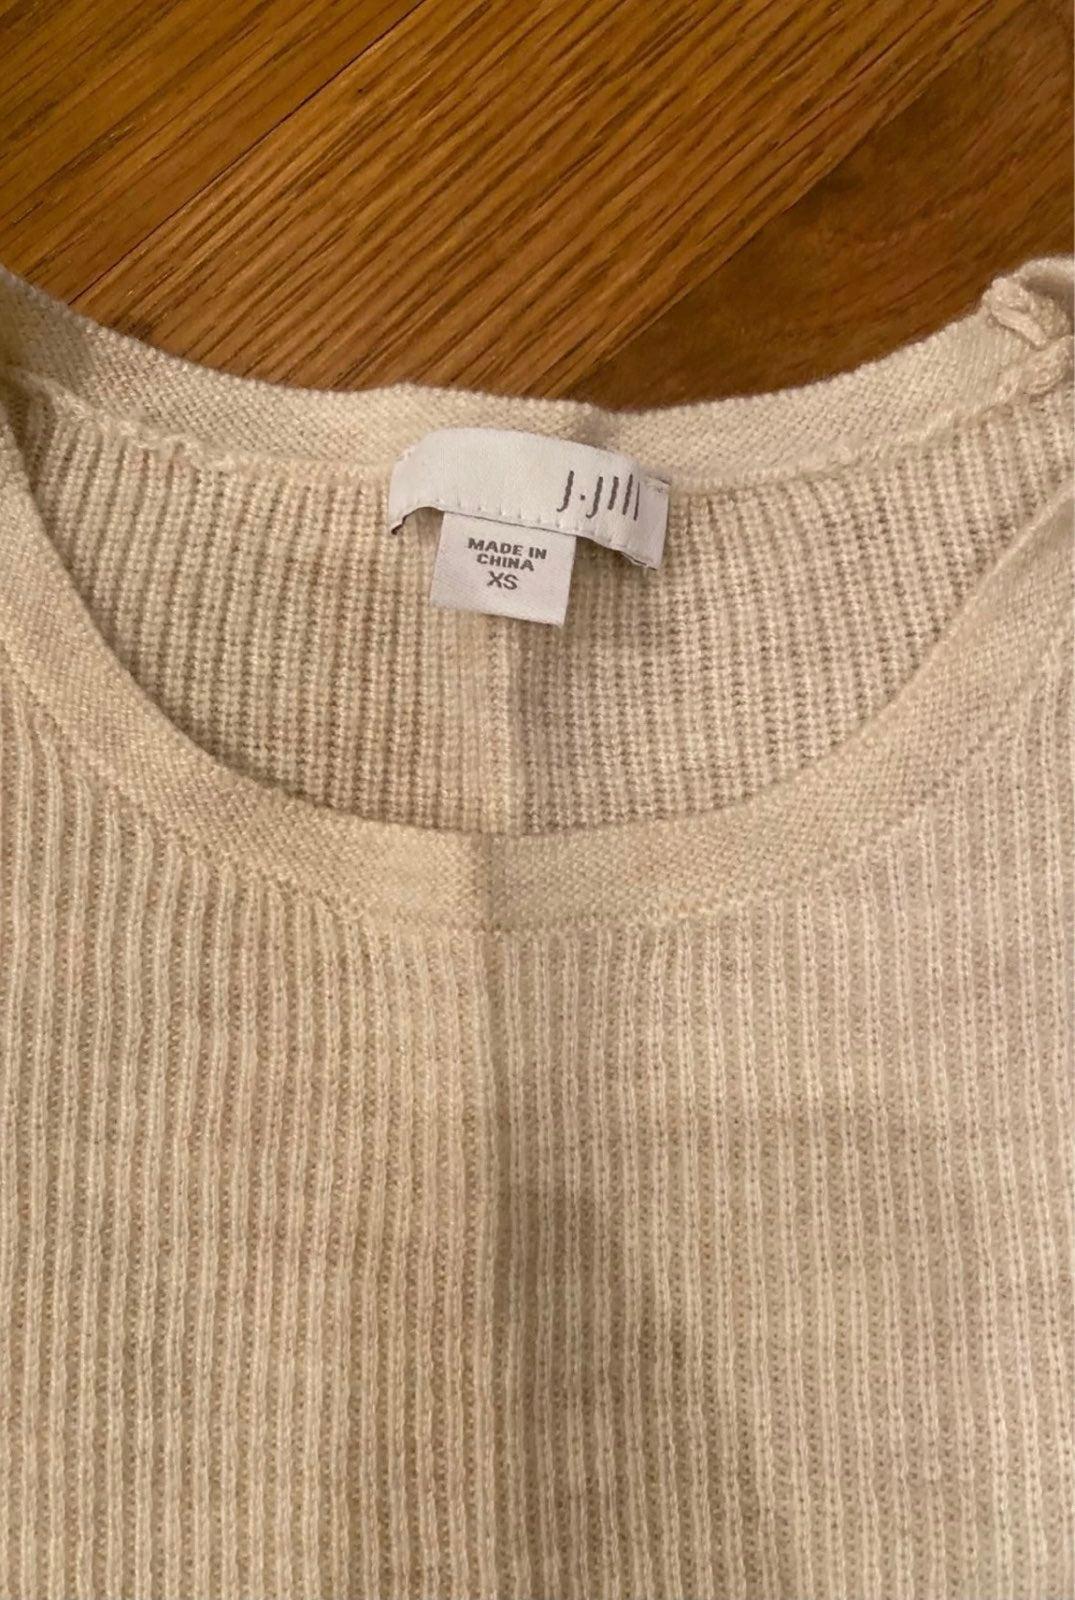 J Jill 3/4 Sleeve Soft Light Sweater XS